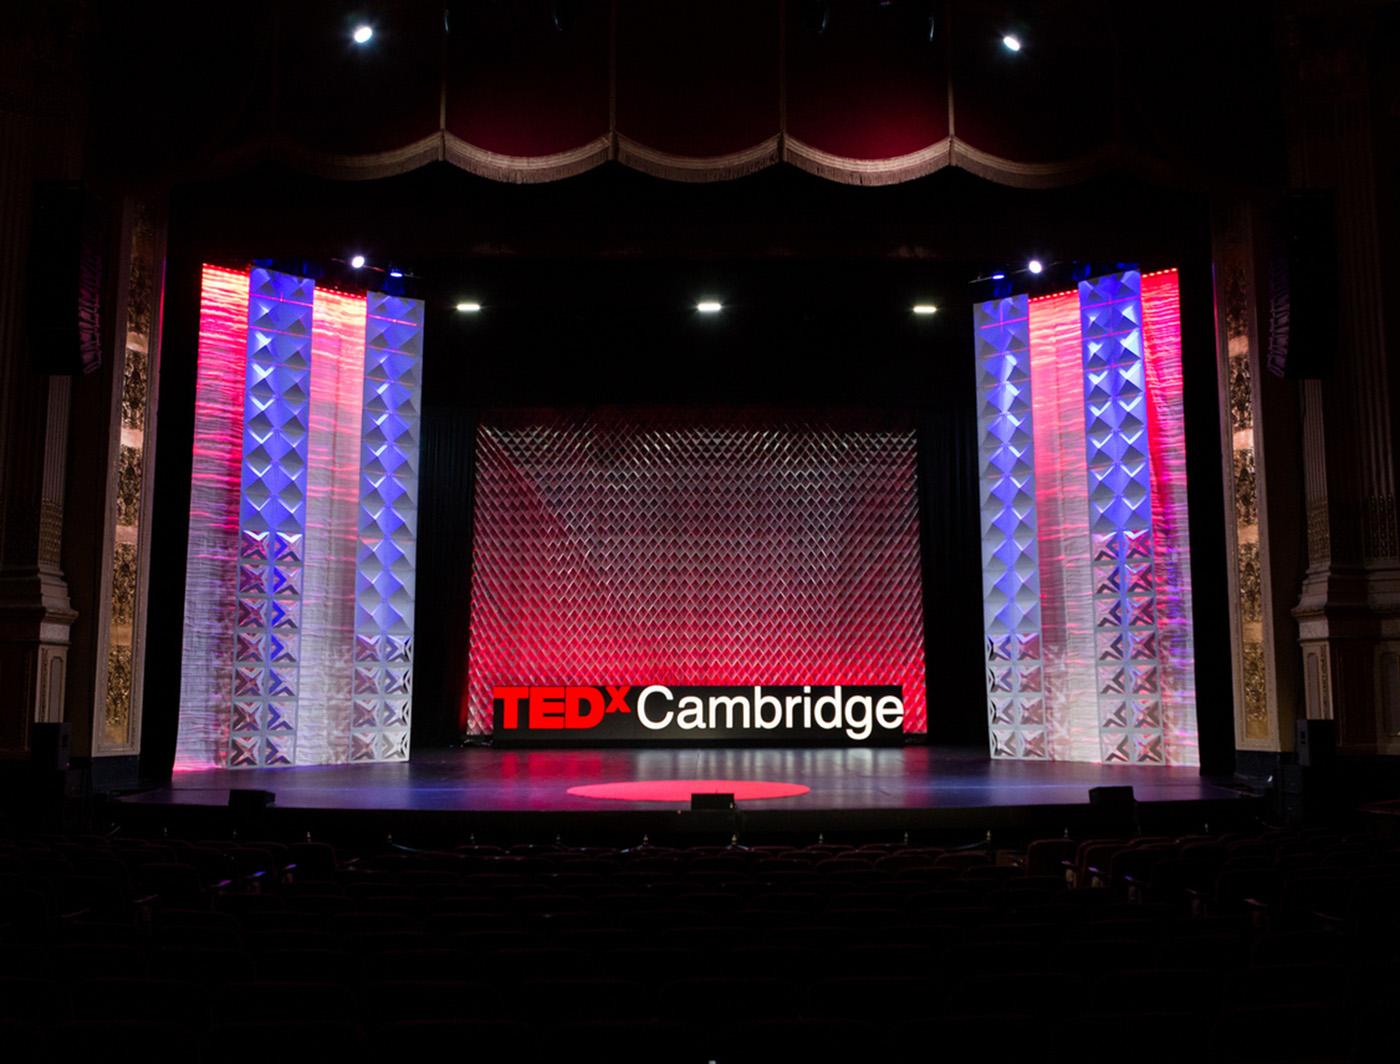 CELL CLOTH at Tedx Cambridge 2017